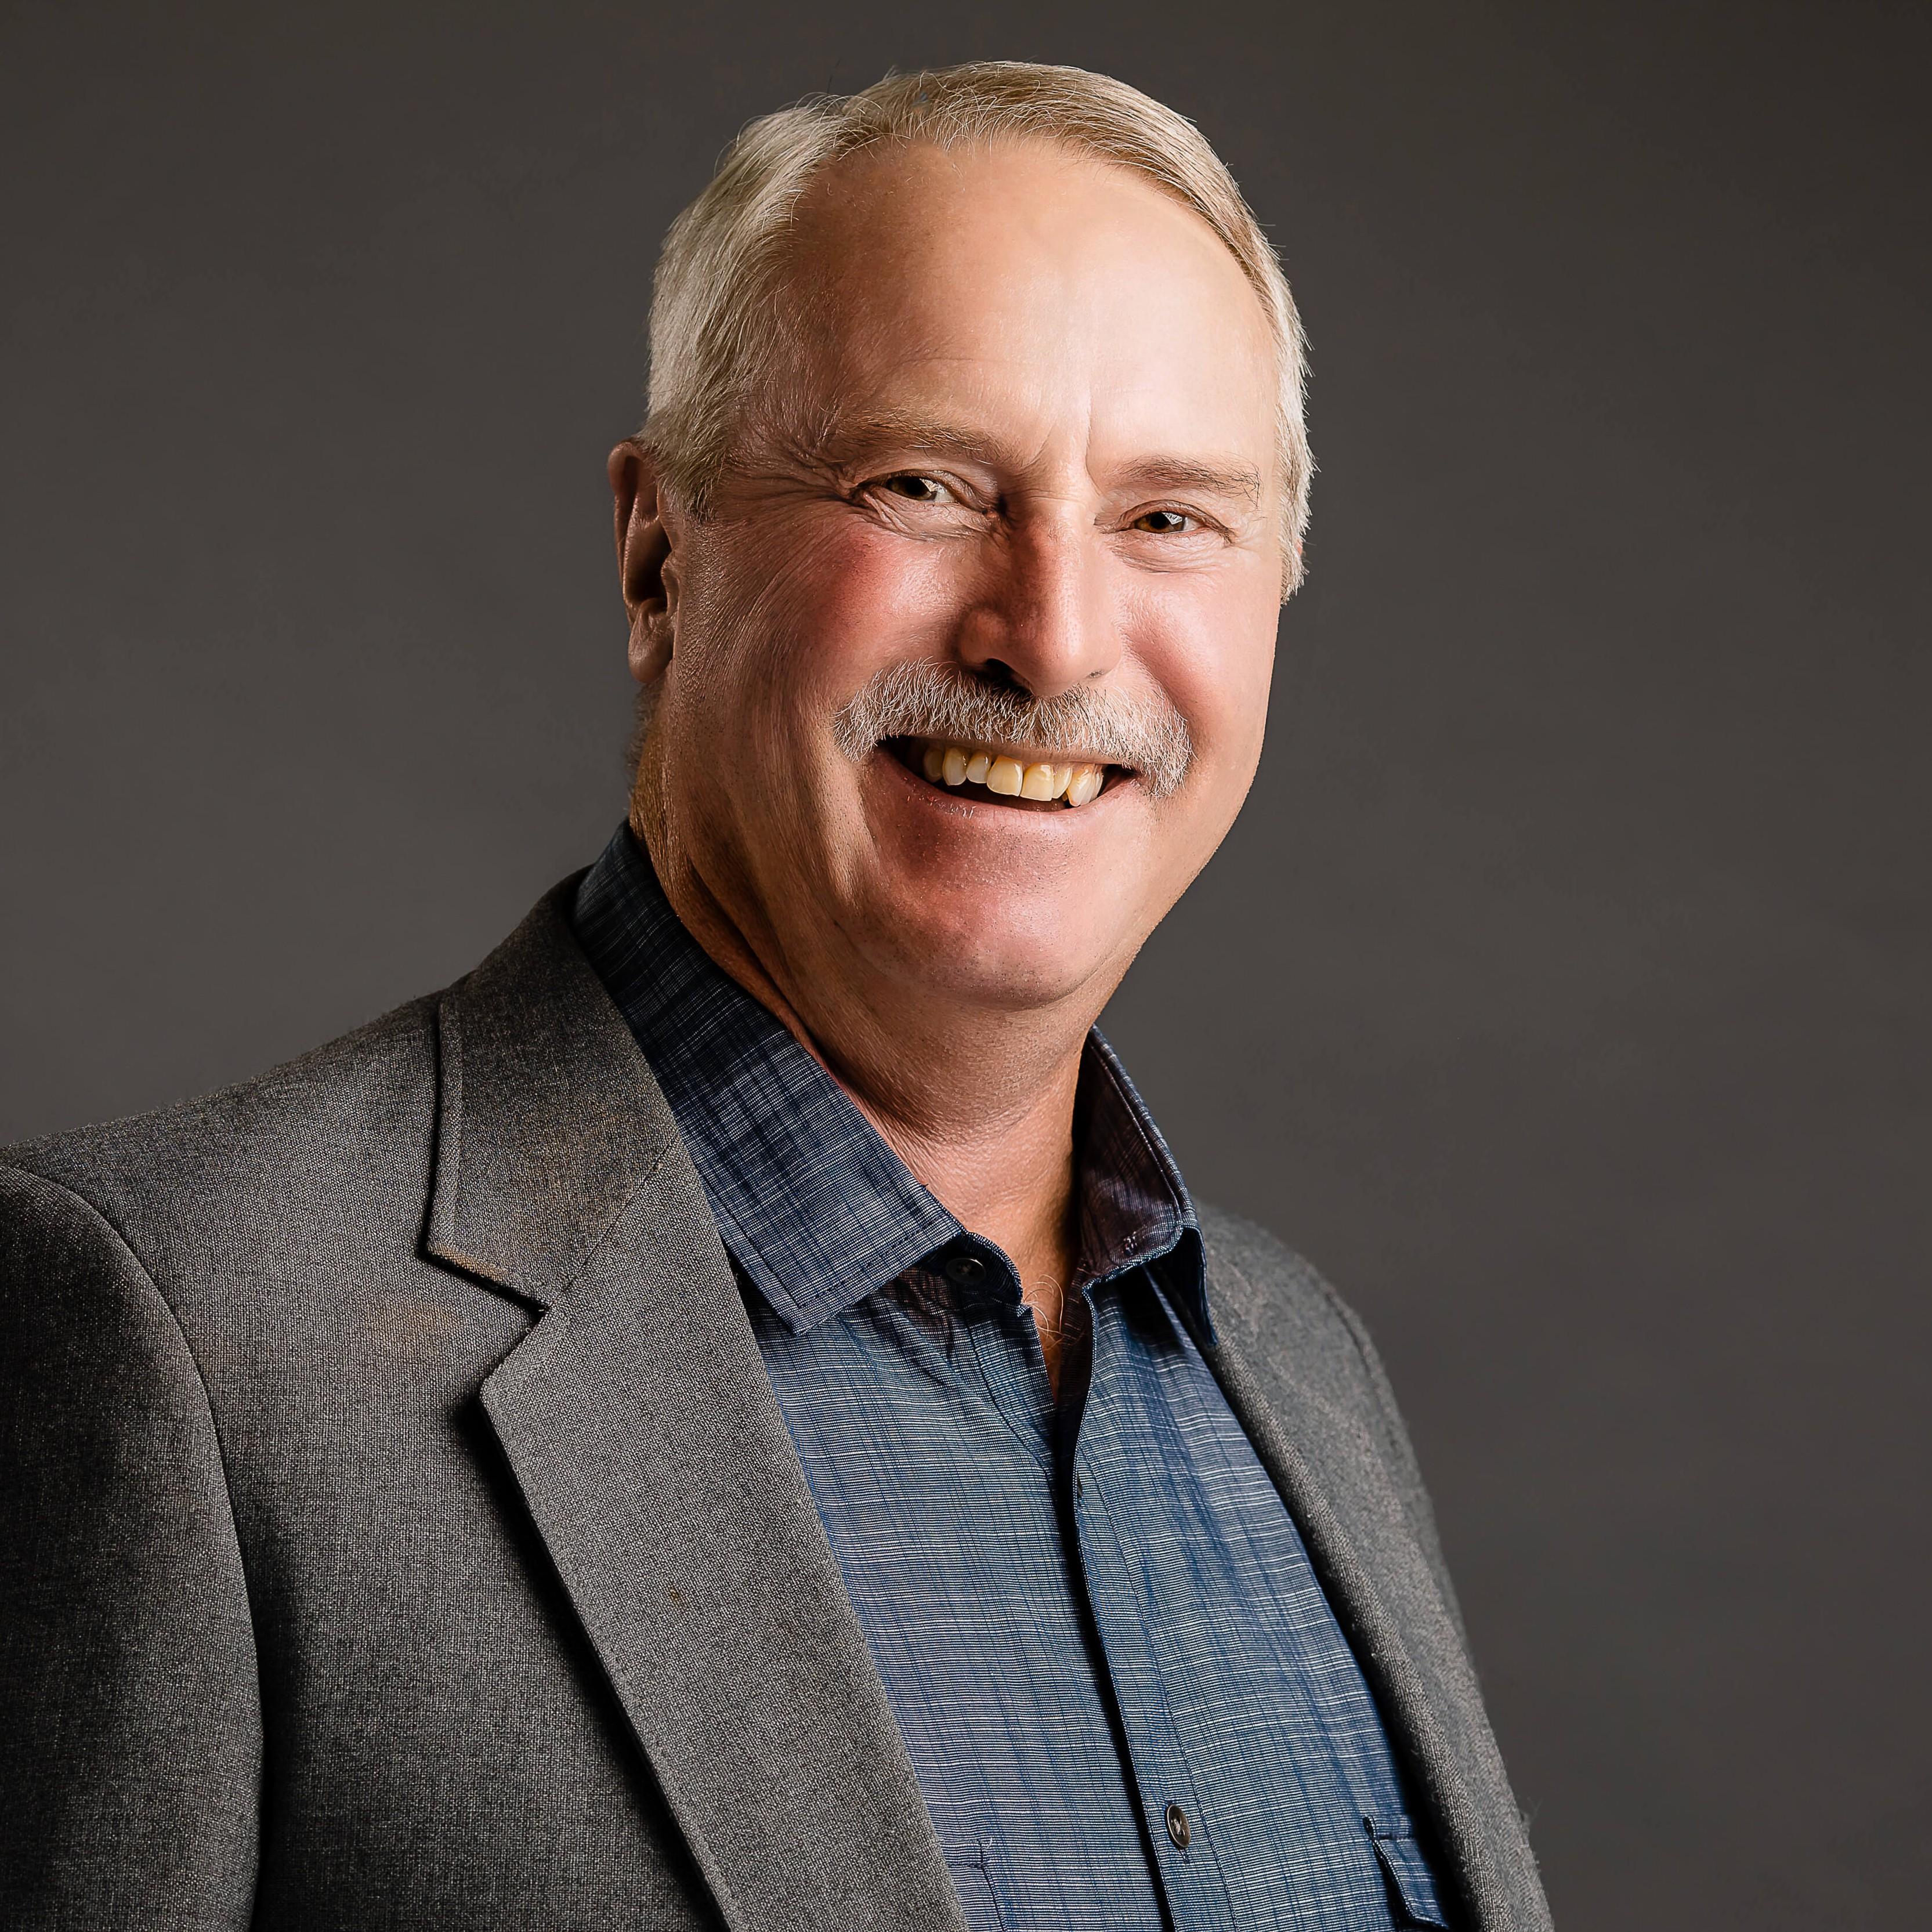 Mike McDowell